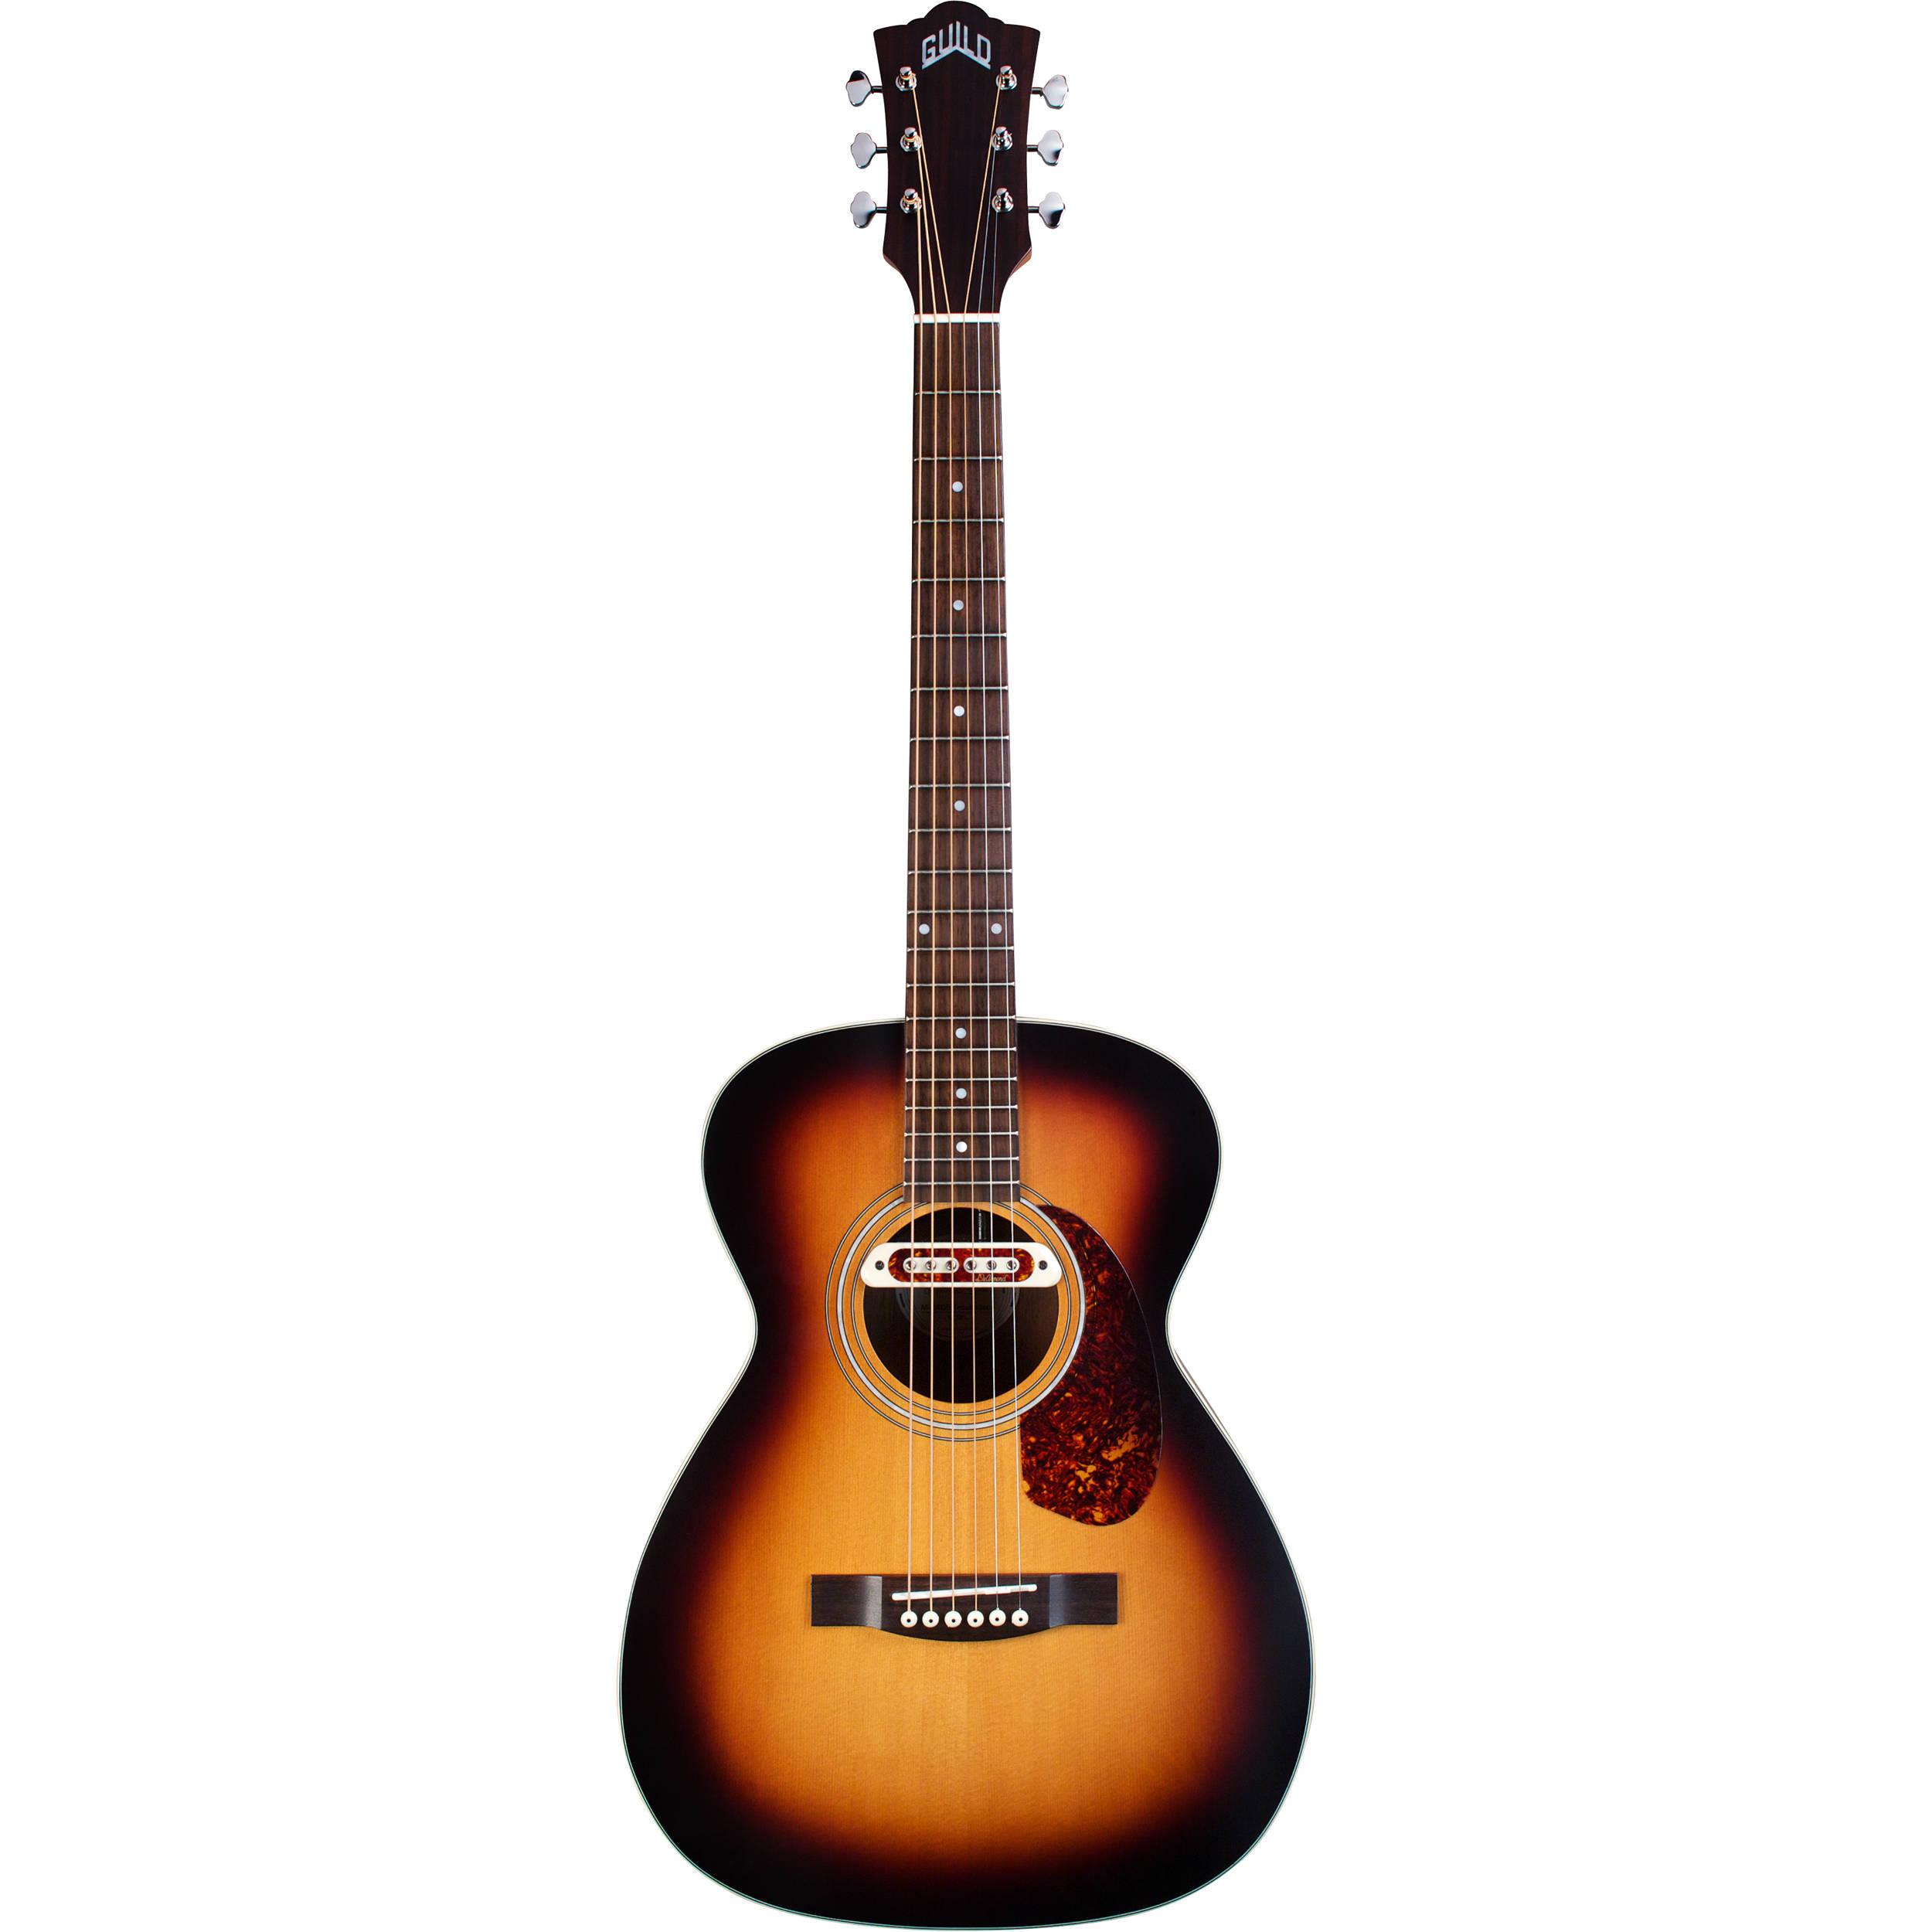 guild guitars m 240e troubadour westerly collection 383 1404 837. Black Bedroom Furniture Sets. Home Design Ideas